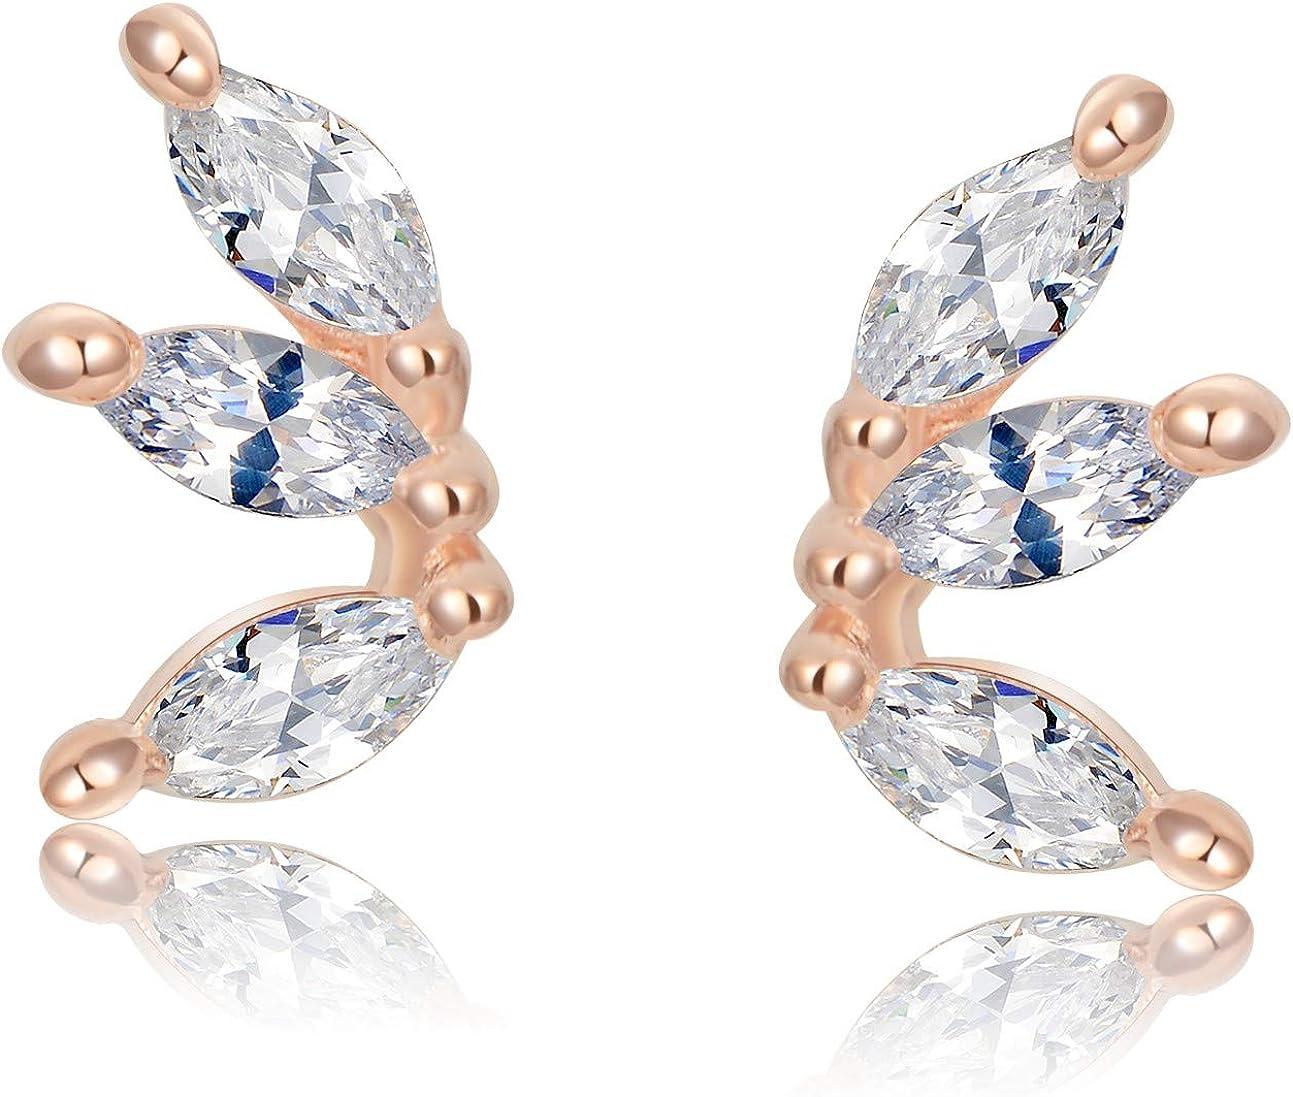 Tiny Earrings Delicate Earrings Tiny CZ studs Tiny studs CZ studs CZ earrings Minimal Stud Earrings